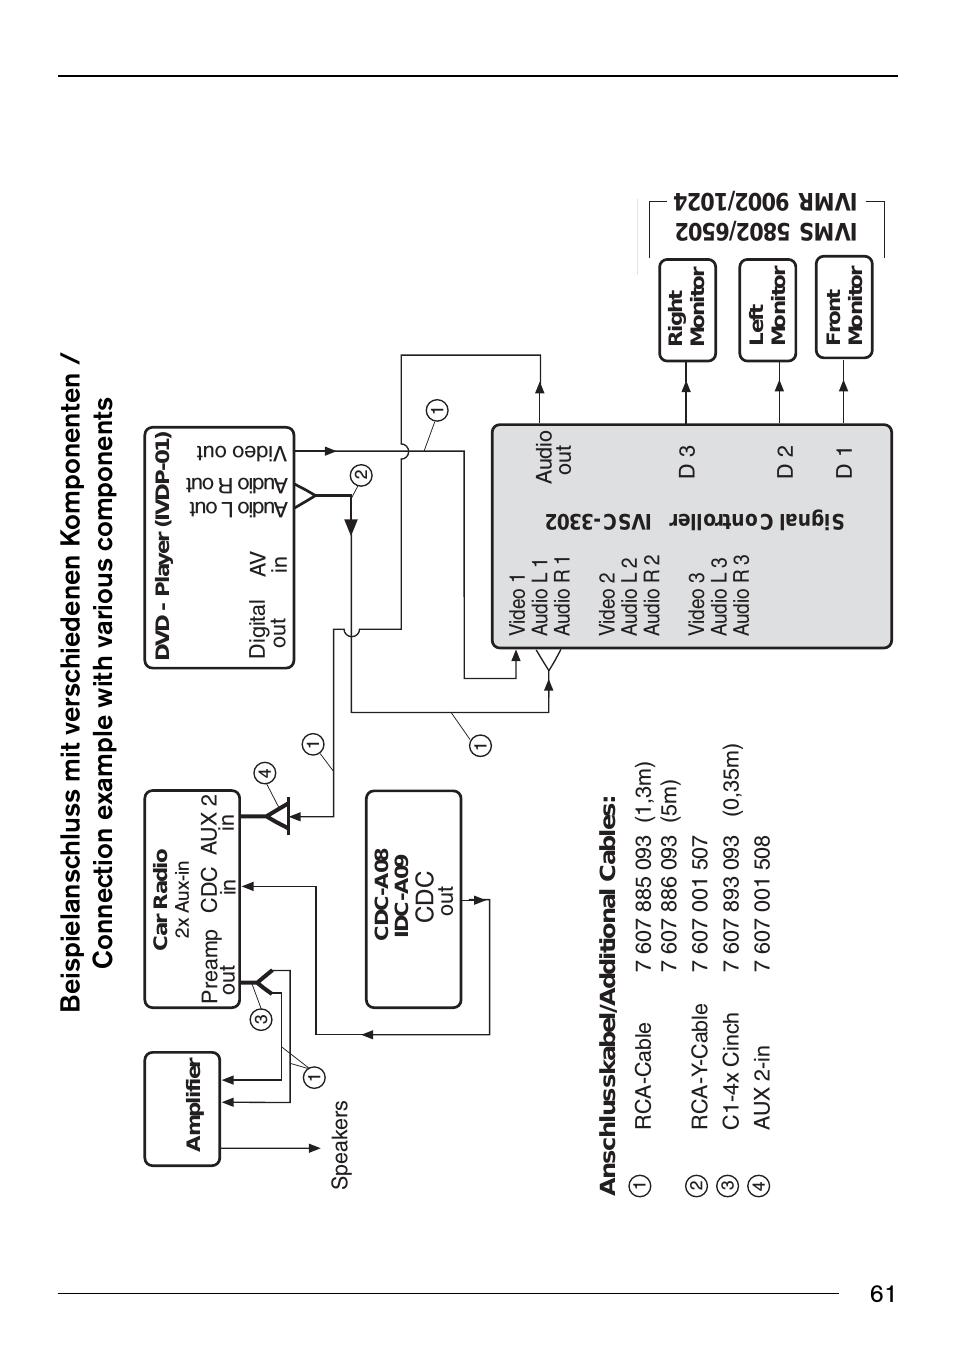 ro_2861] blaupunkt car 300 wiring diagram schematic wiring  otene over nuvit nuvit botse antus nect rdona scoba mohammedshrine librar  wiring 101